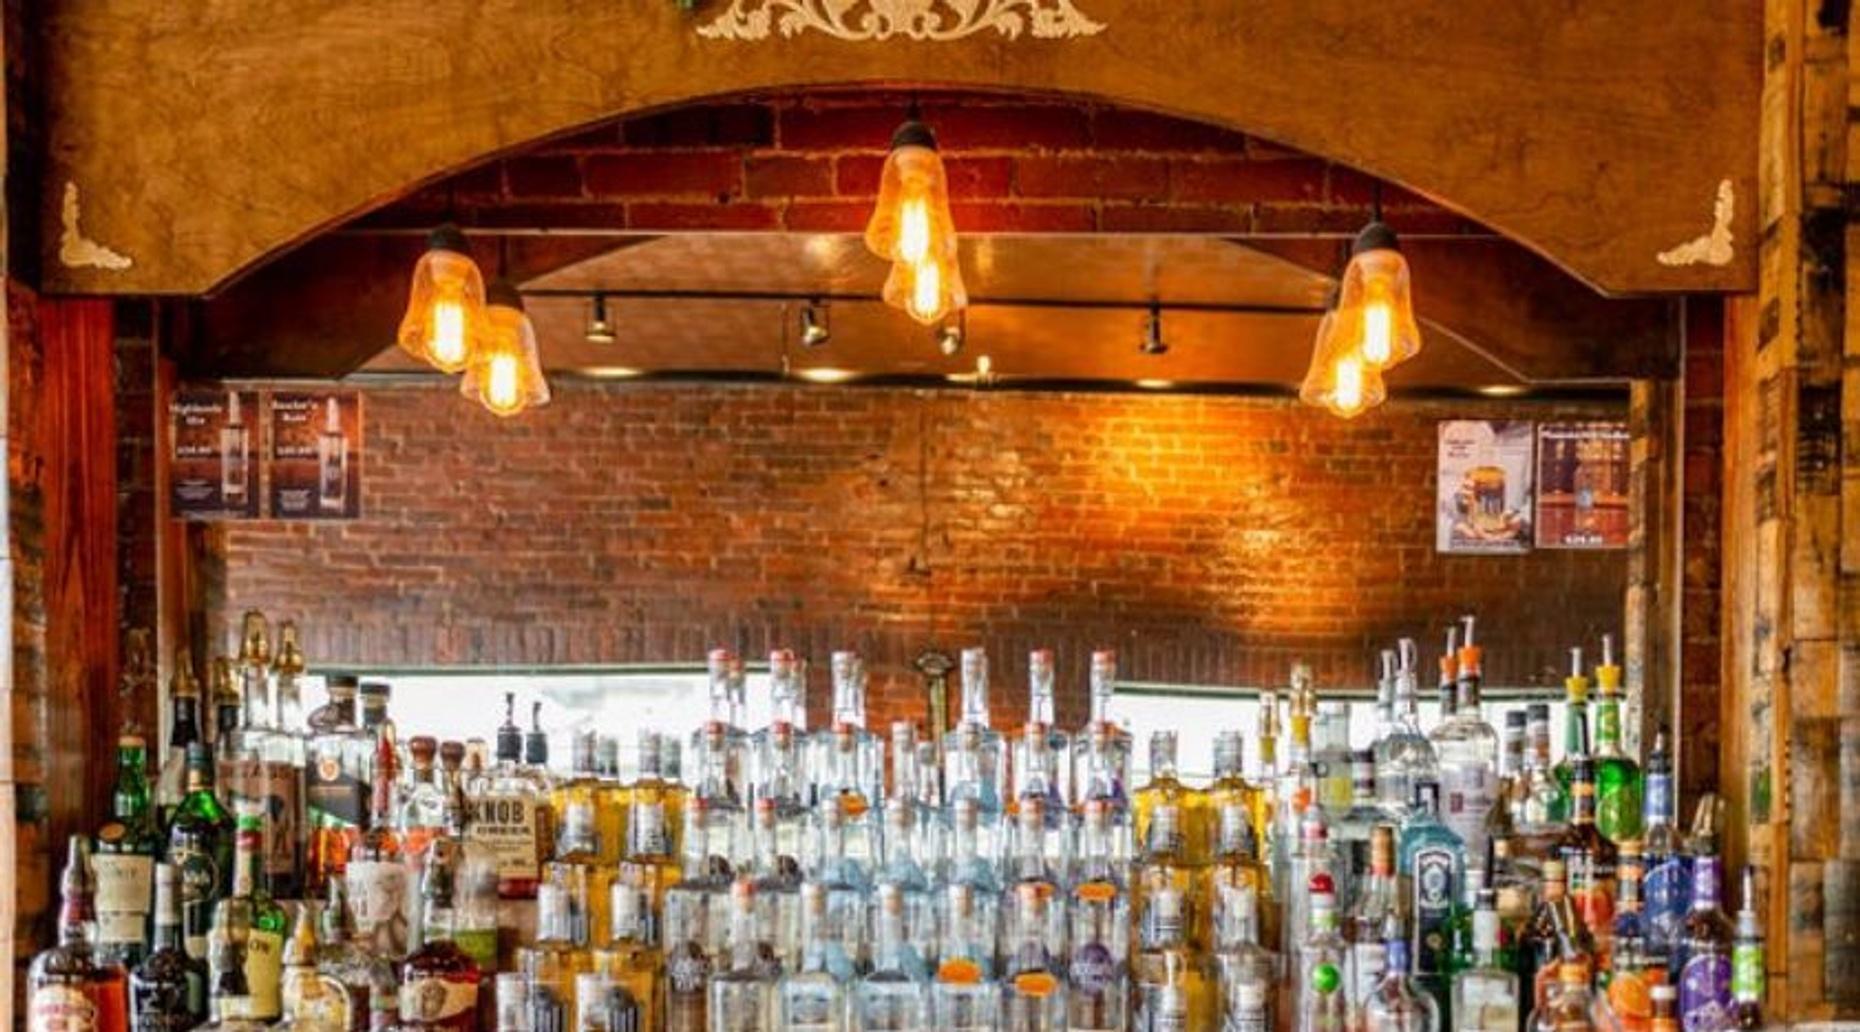 Downtown Louisville Distillery Tour & Tasting